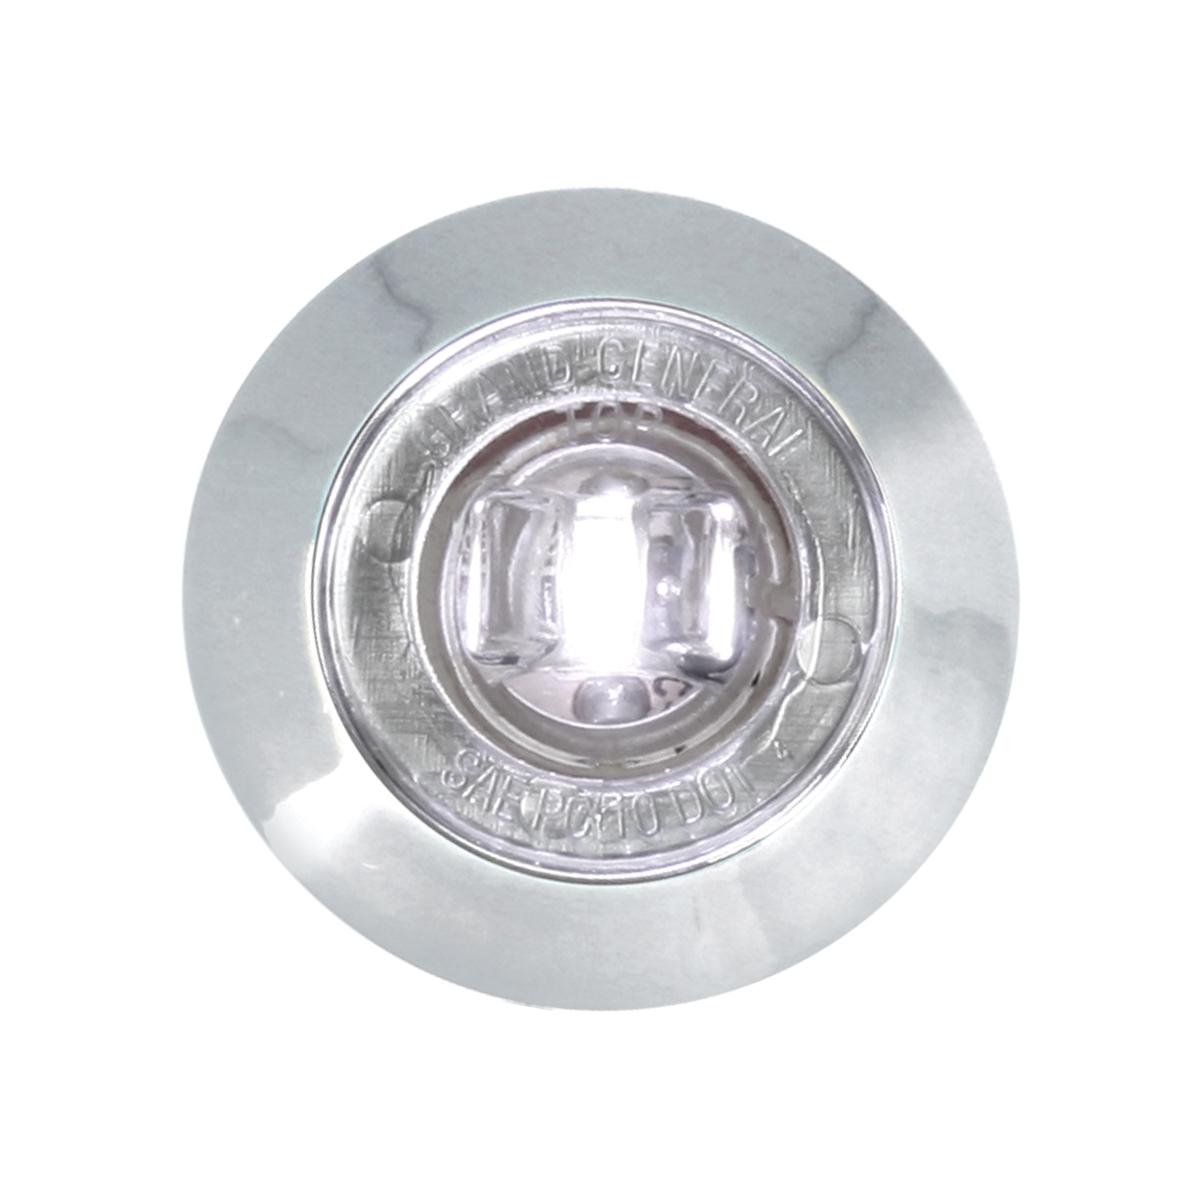 "75274 1"" Dual Function Mini Push/Screw-in Wide Angle LED Light w/ Chrome Bezel"